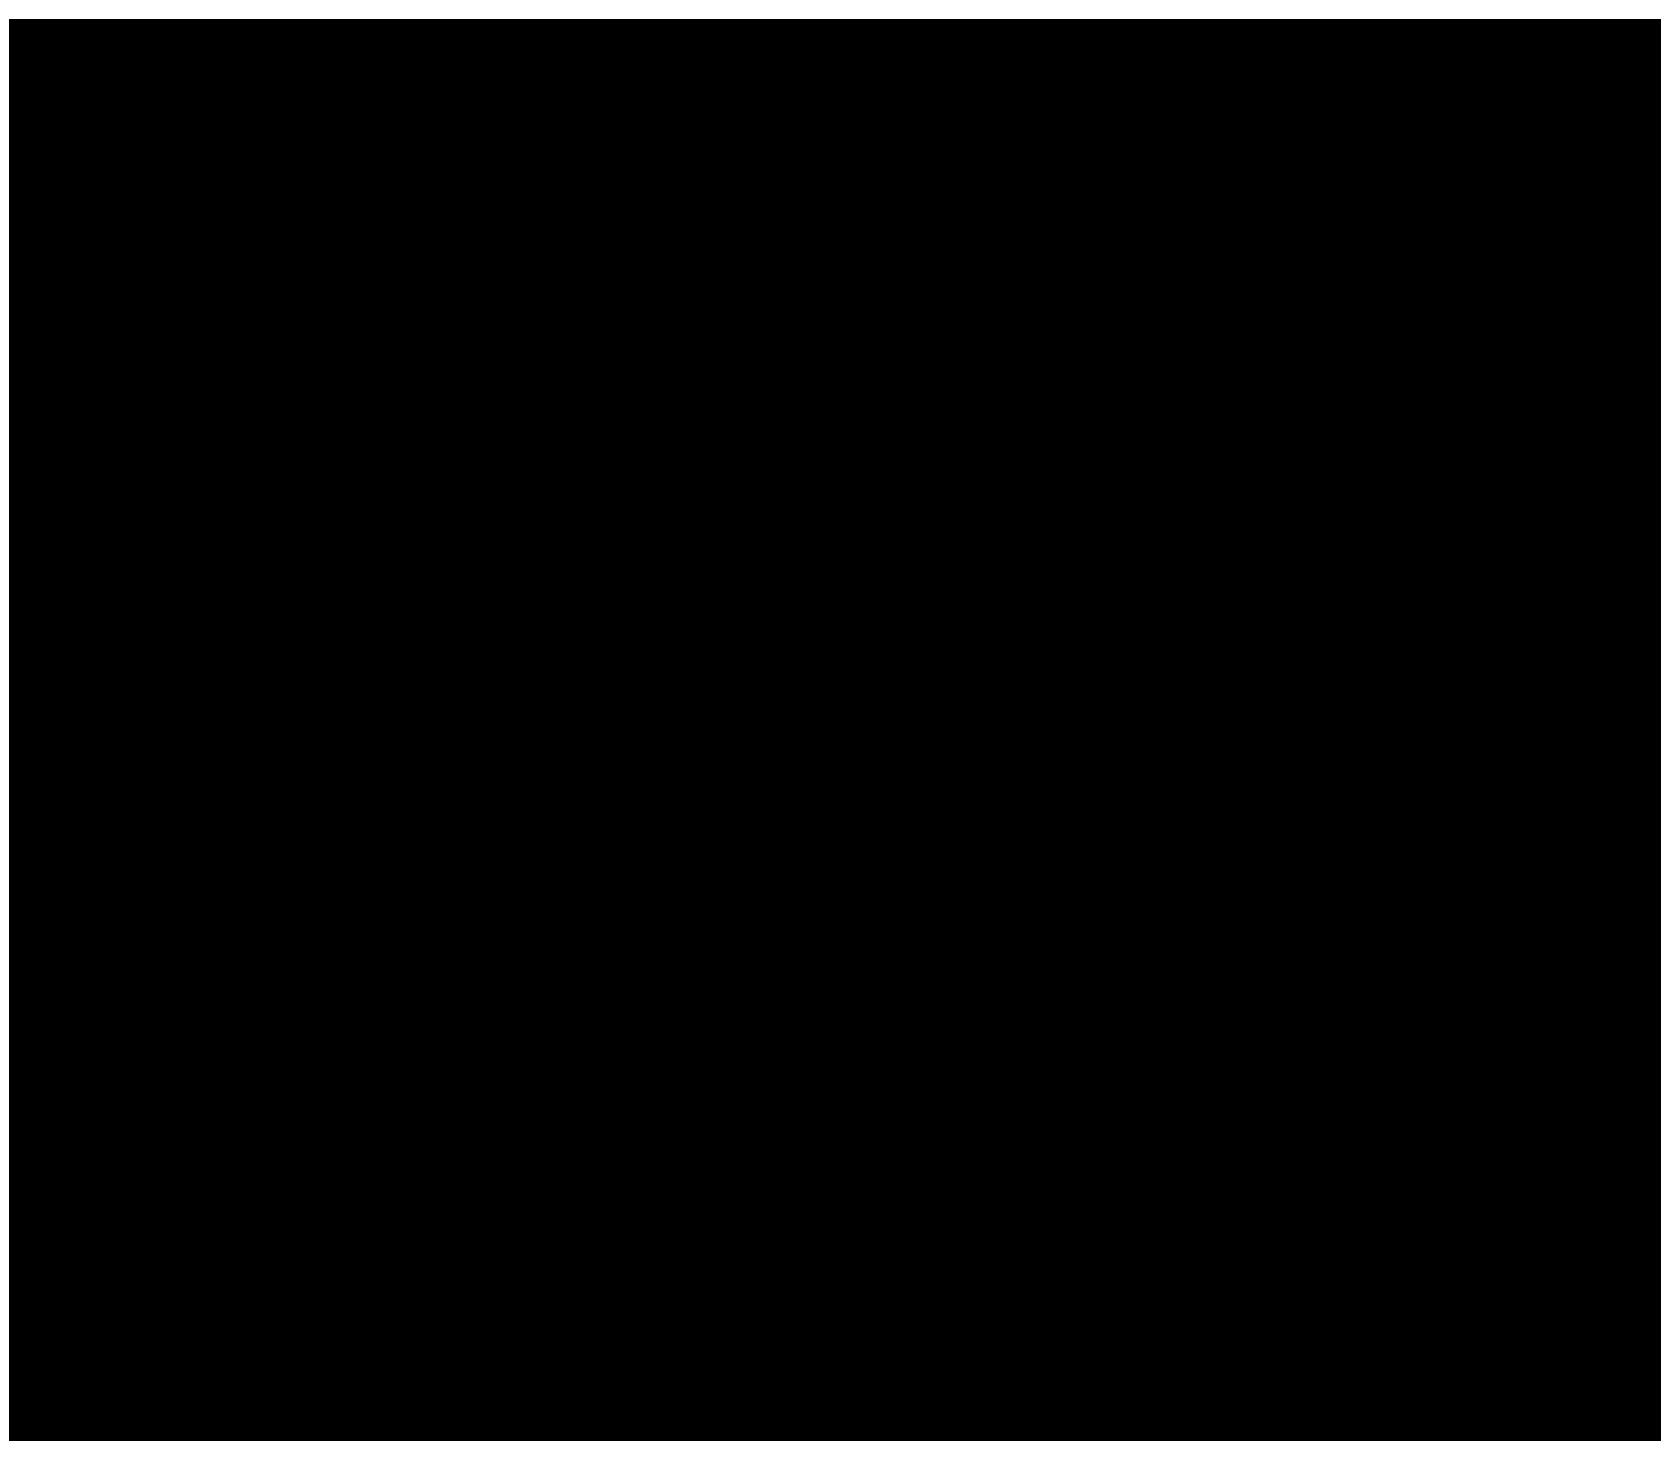 large_black_trans.png